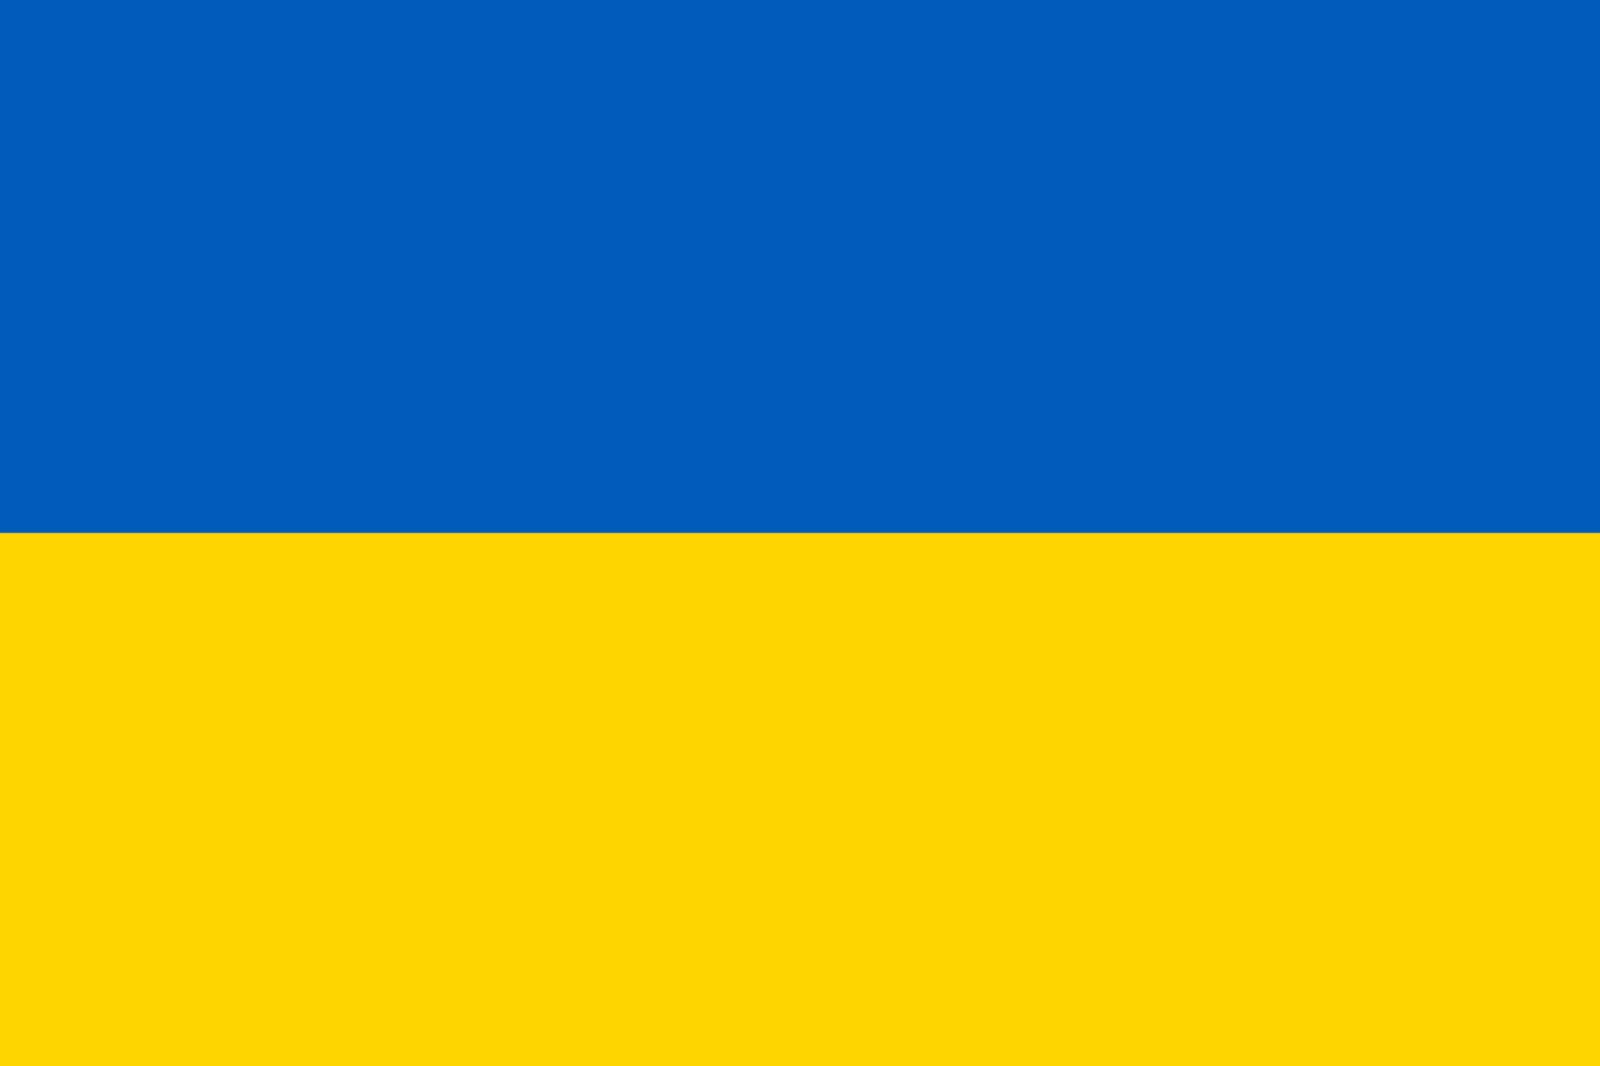 http://carbrandsincurrentproduction.blogspot.com.es/search/label/Ukraine